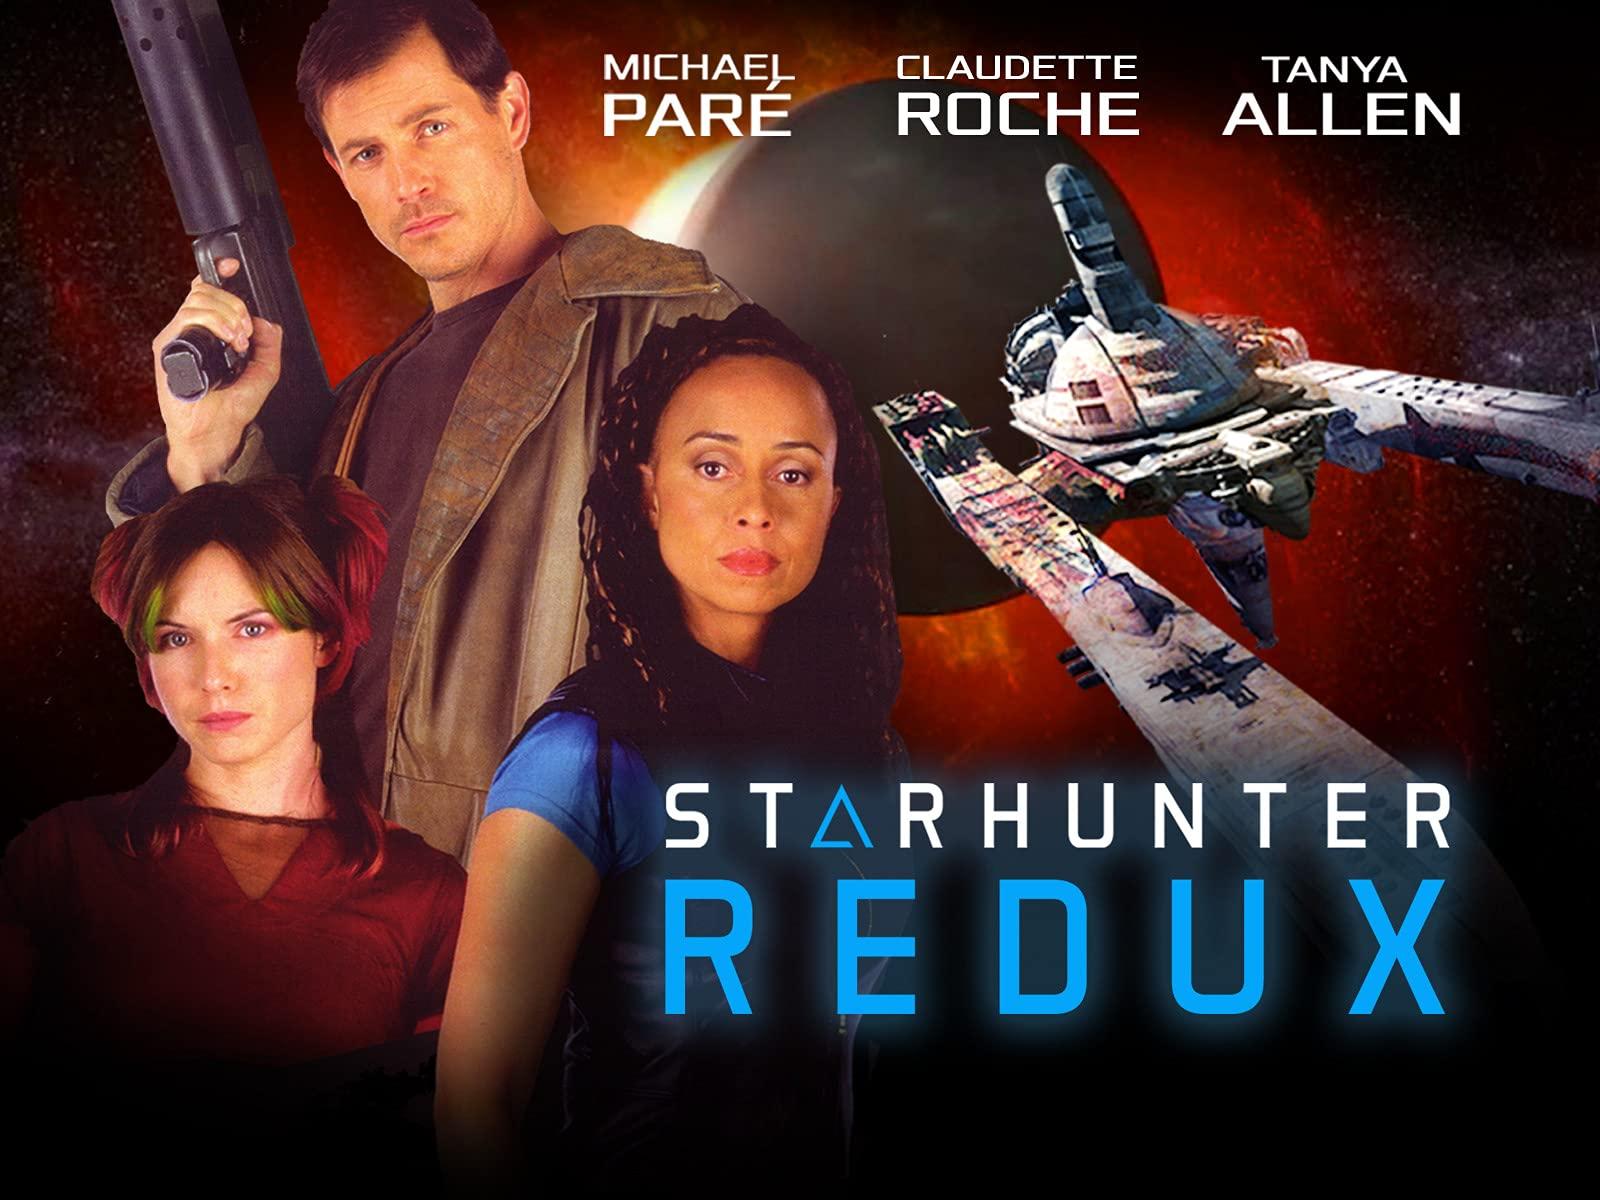 Starhunter Redux